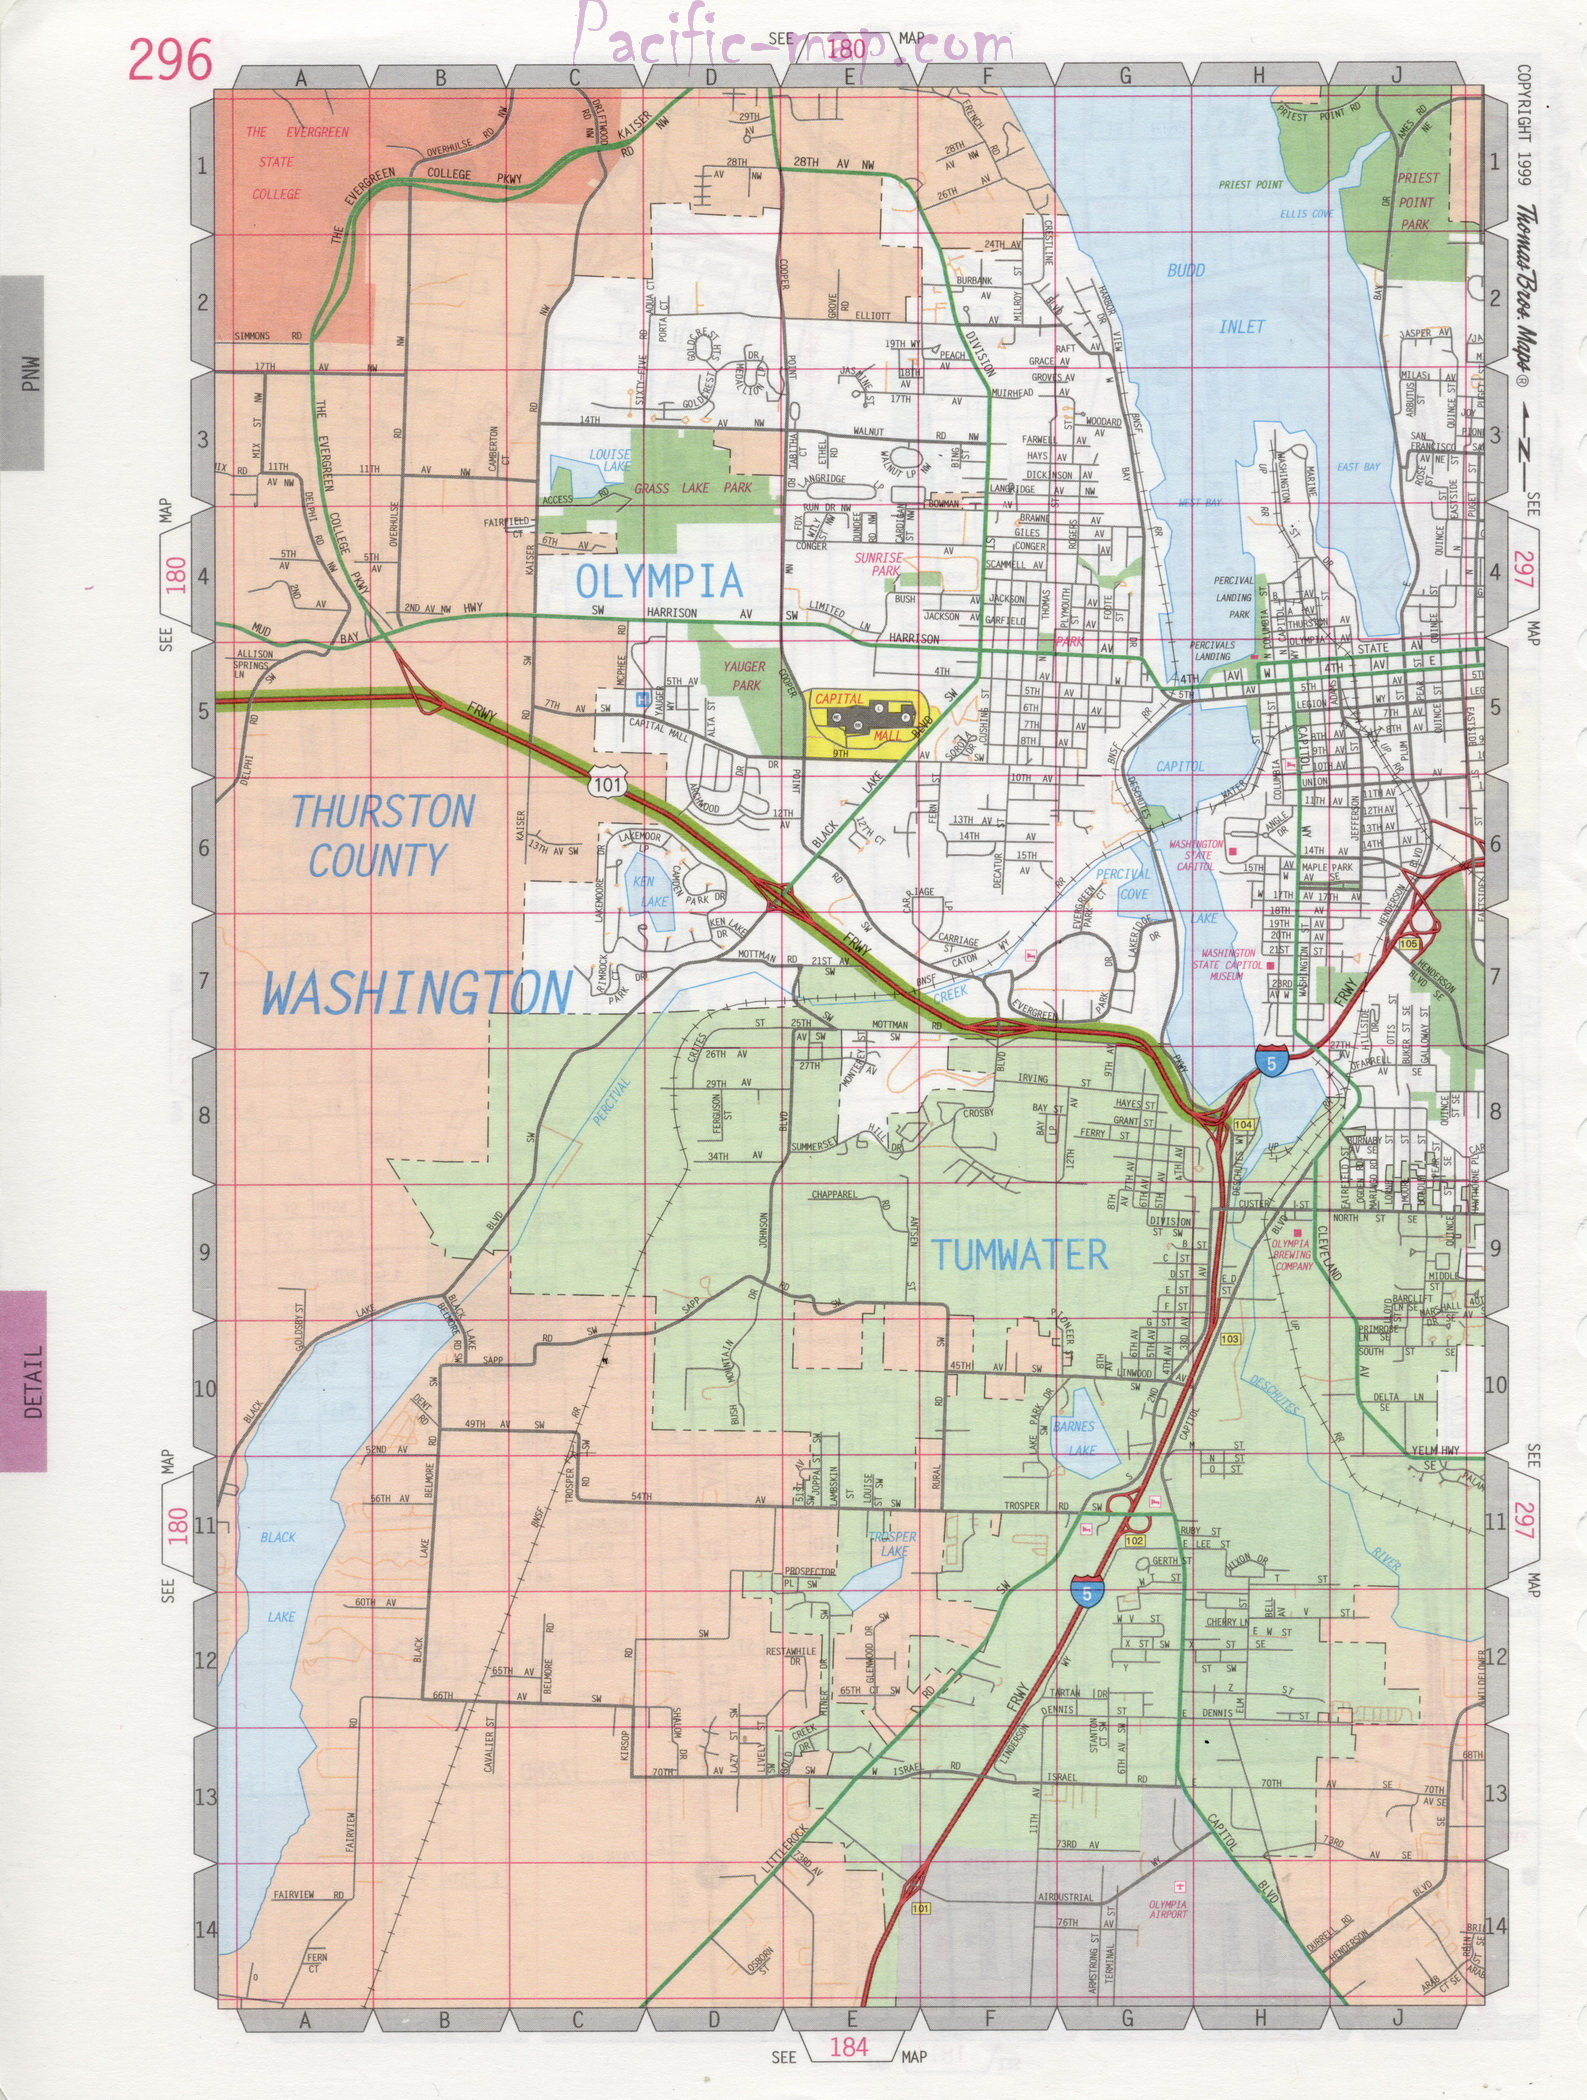 Tumwater road map